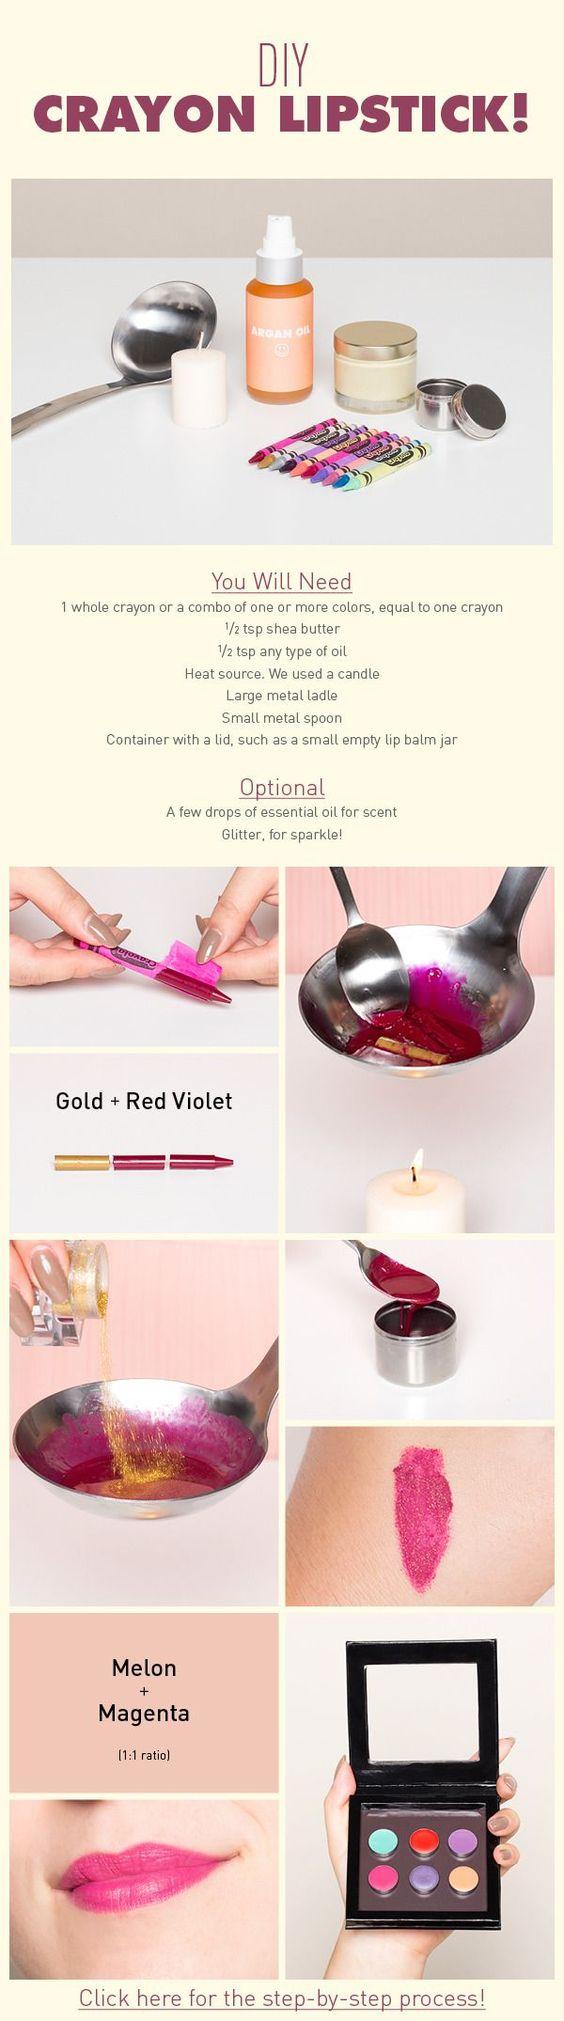 7 DIY Crayon Lipsticks to Make Now